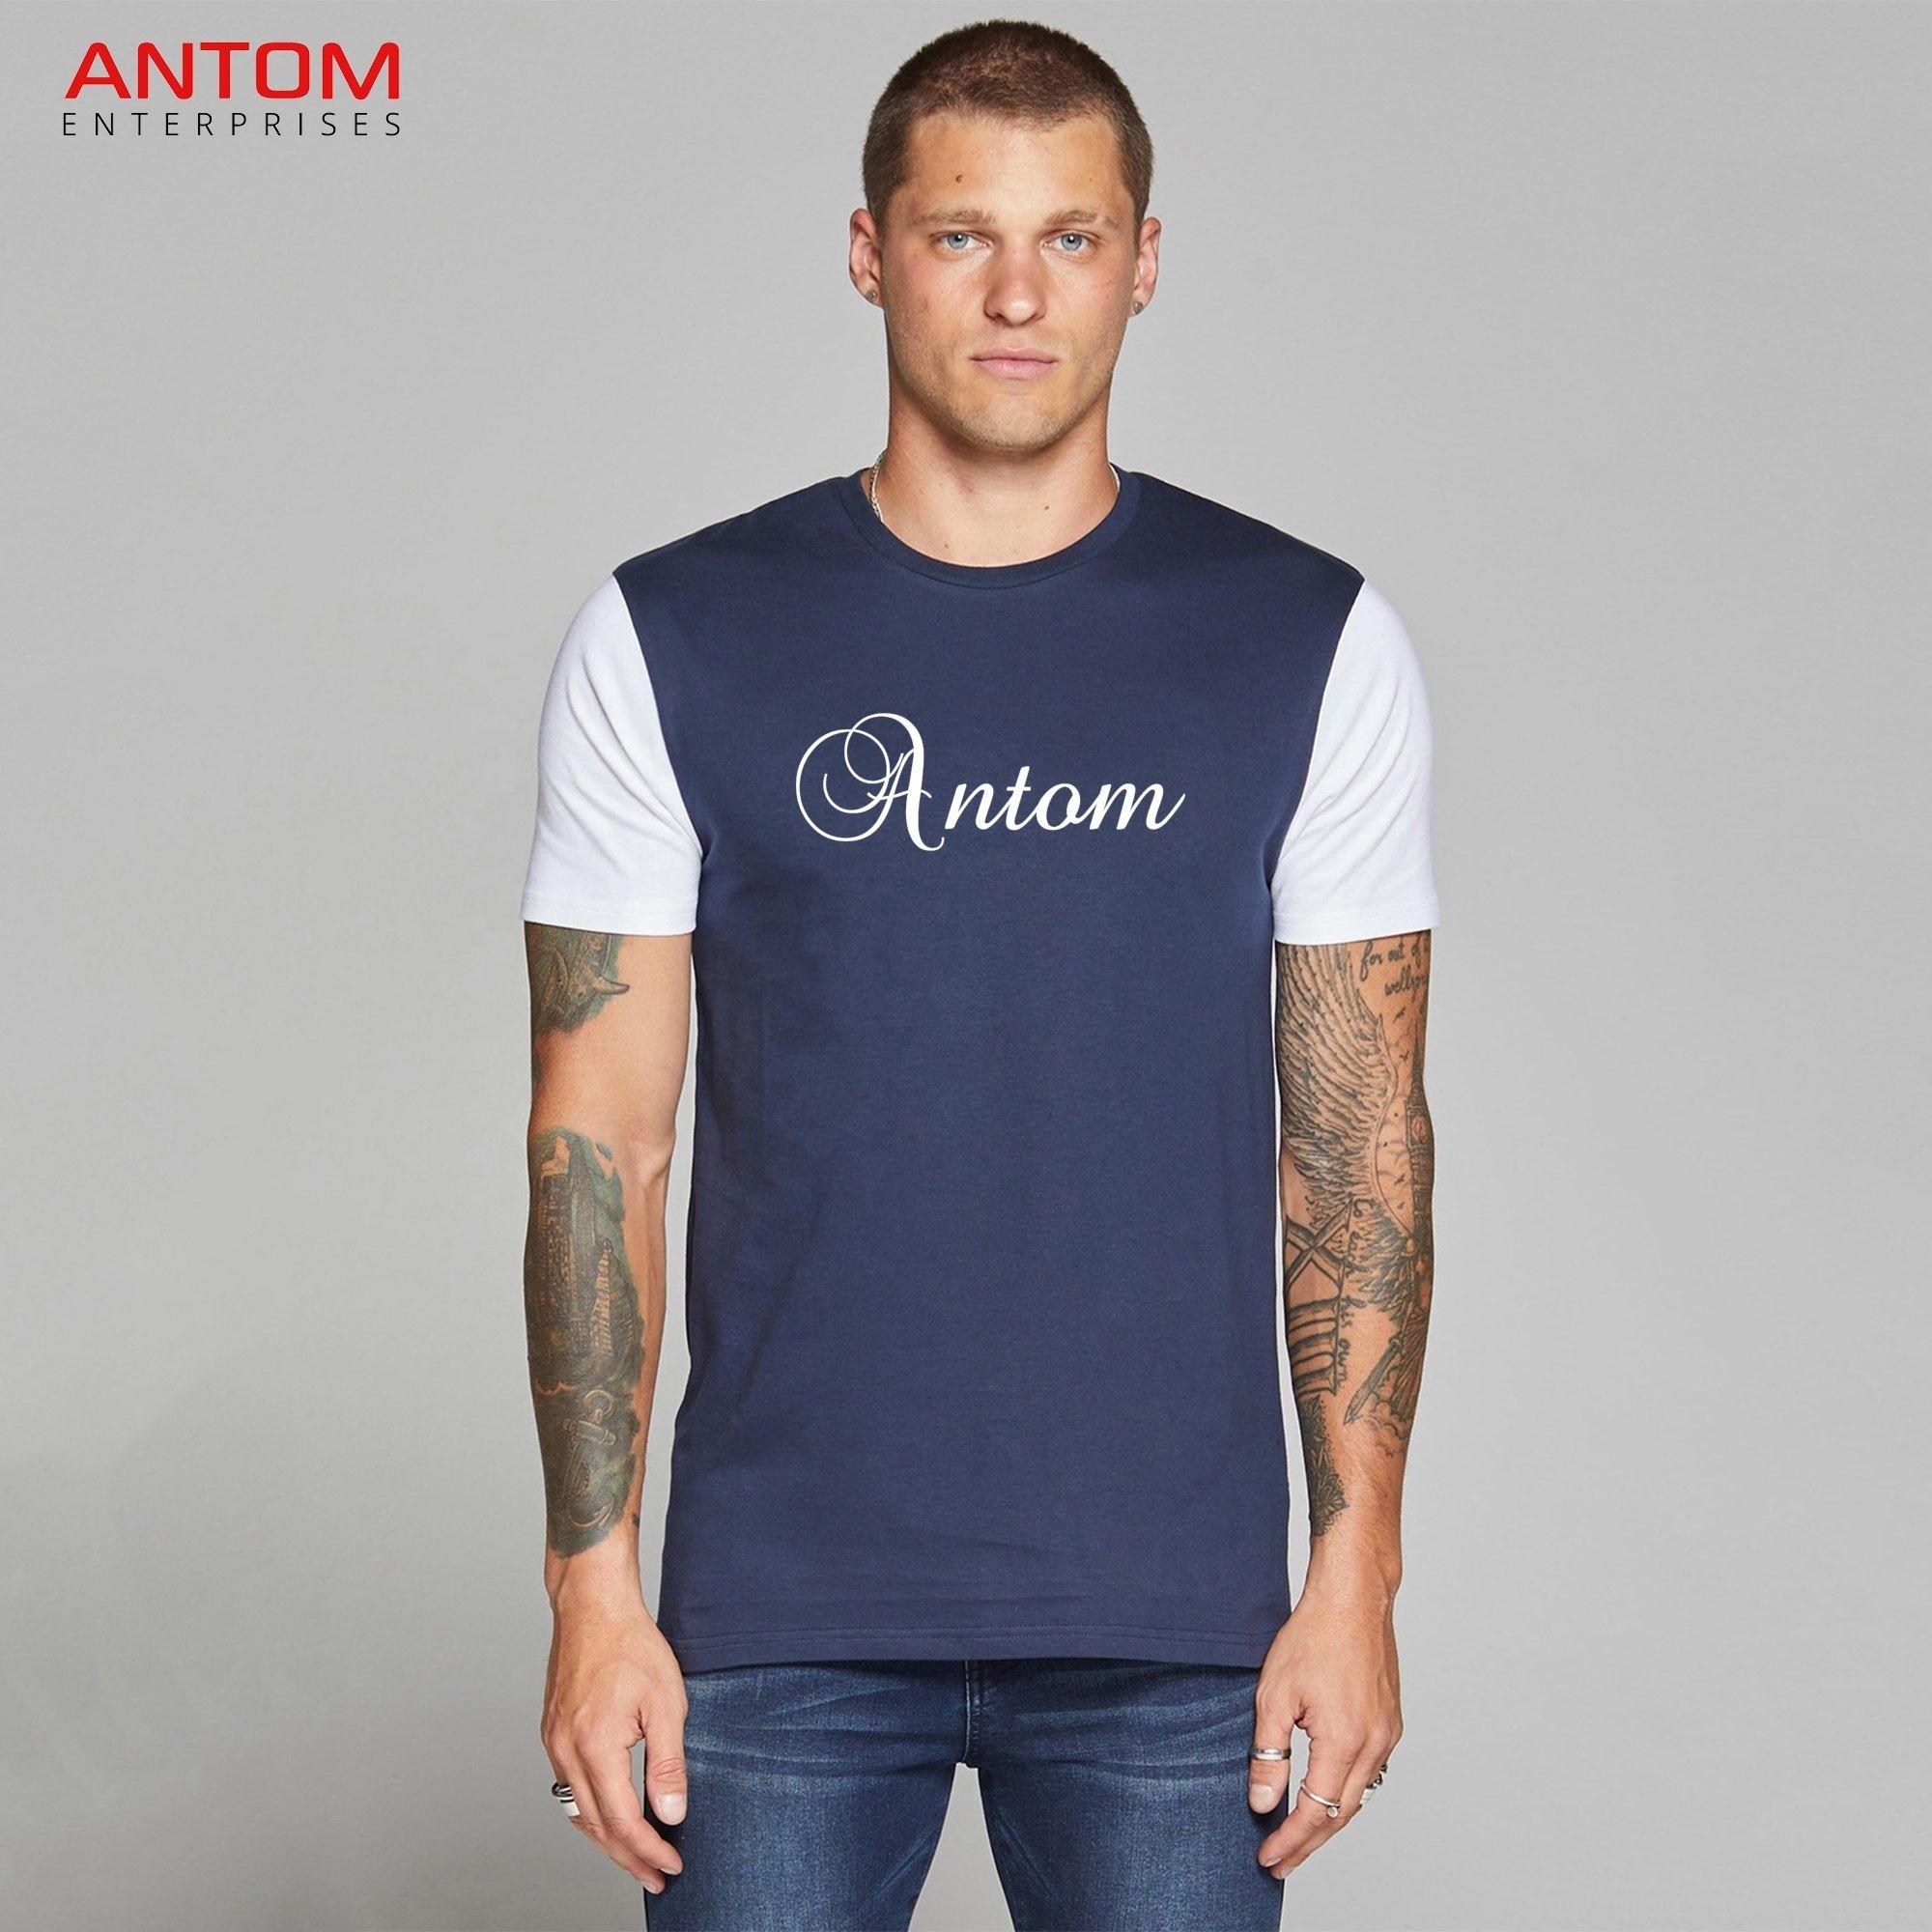 6b9eeeb5f1 Pin by Antom Enterprises on T-shirts in 2019